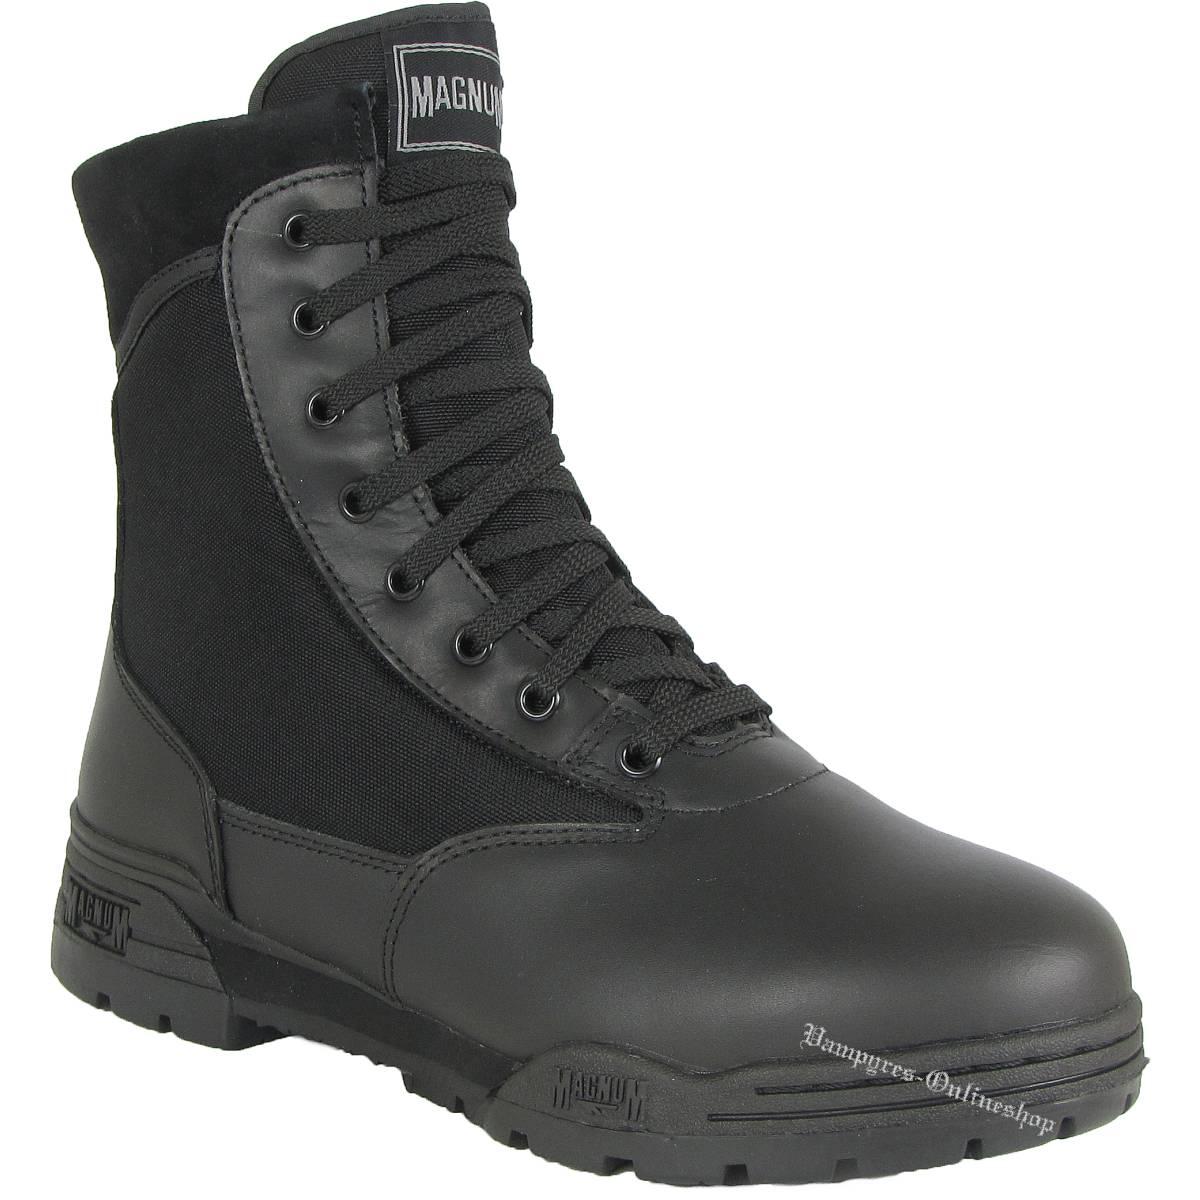 Magnum (Hi-Tec) Regular Classic Schwarz Schuhe Boots Stiefel